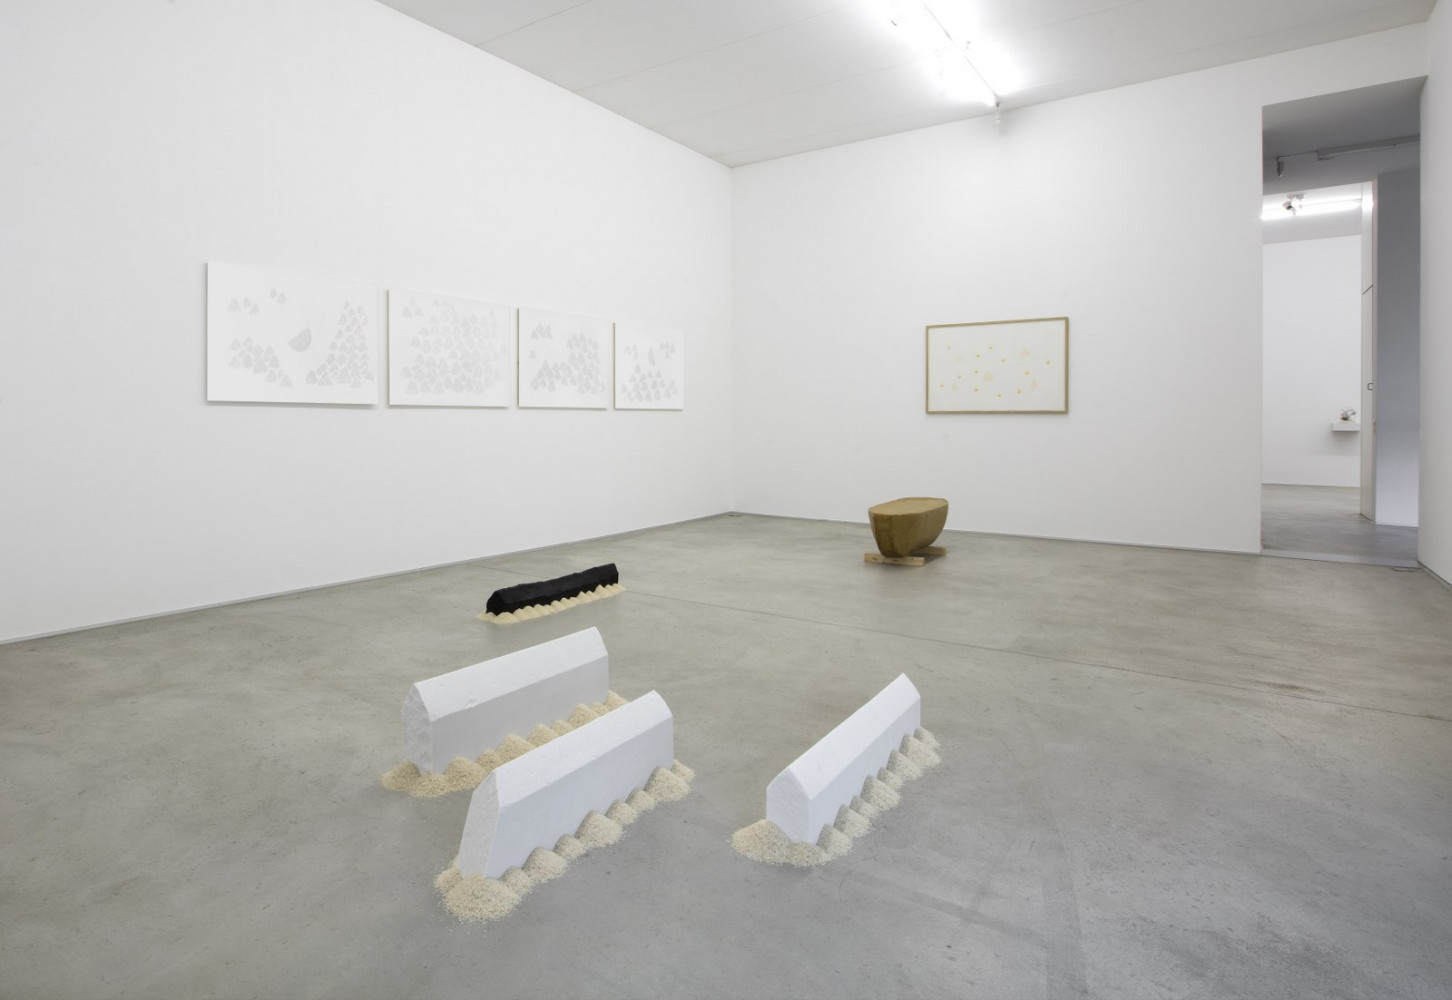 Wolfgang Laib, Installation view, Buchmann Lugano, 2017